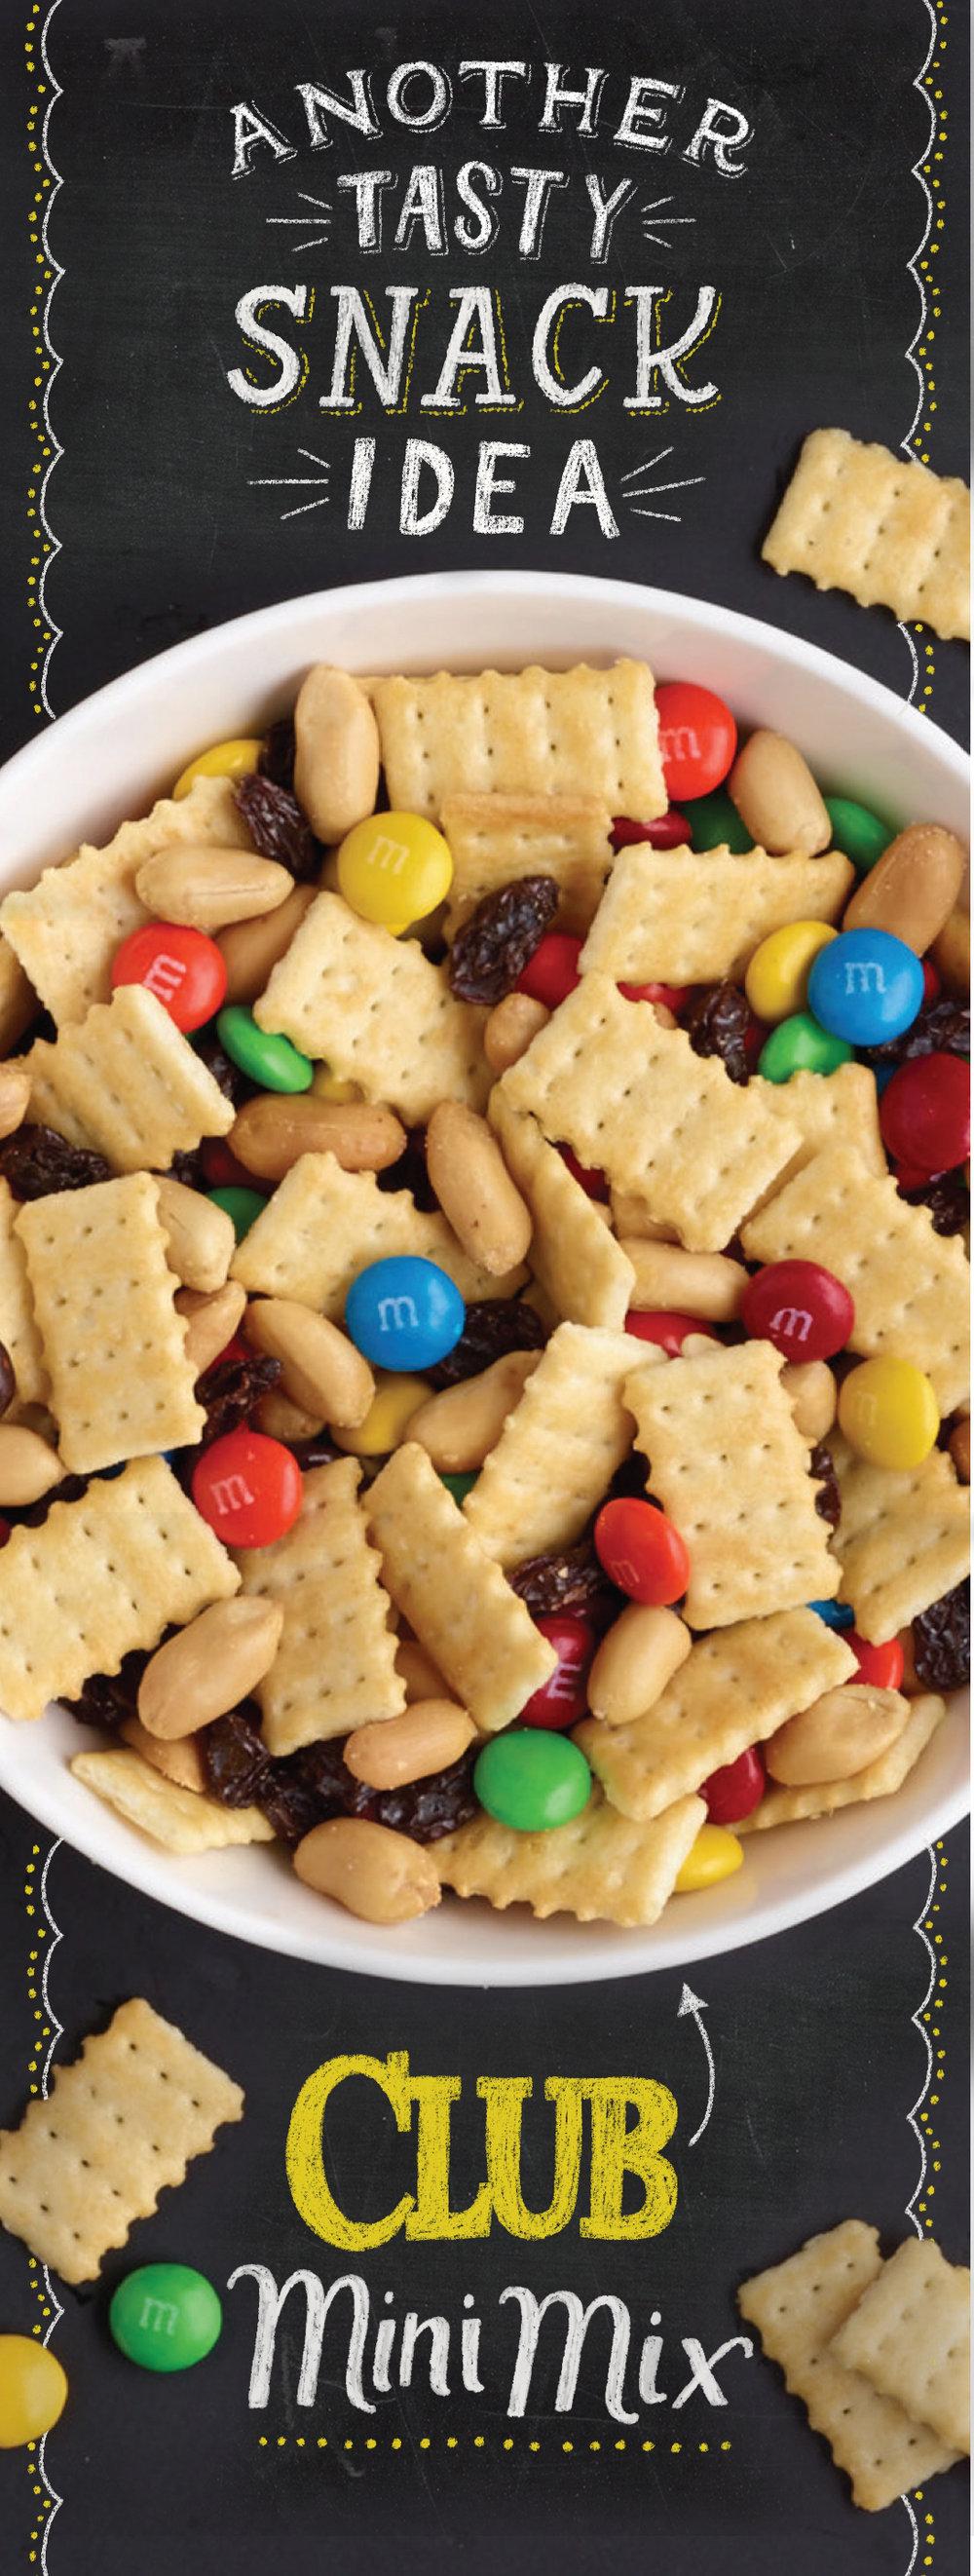 Club Crackers - Mary Kate McDevitt